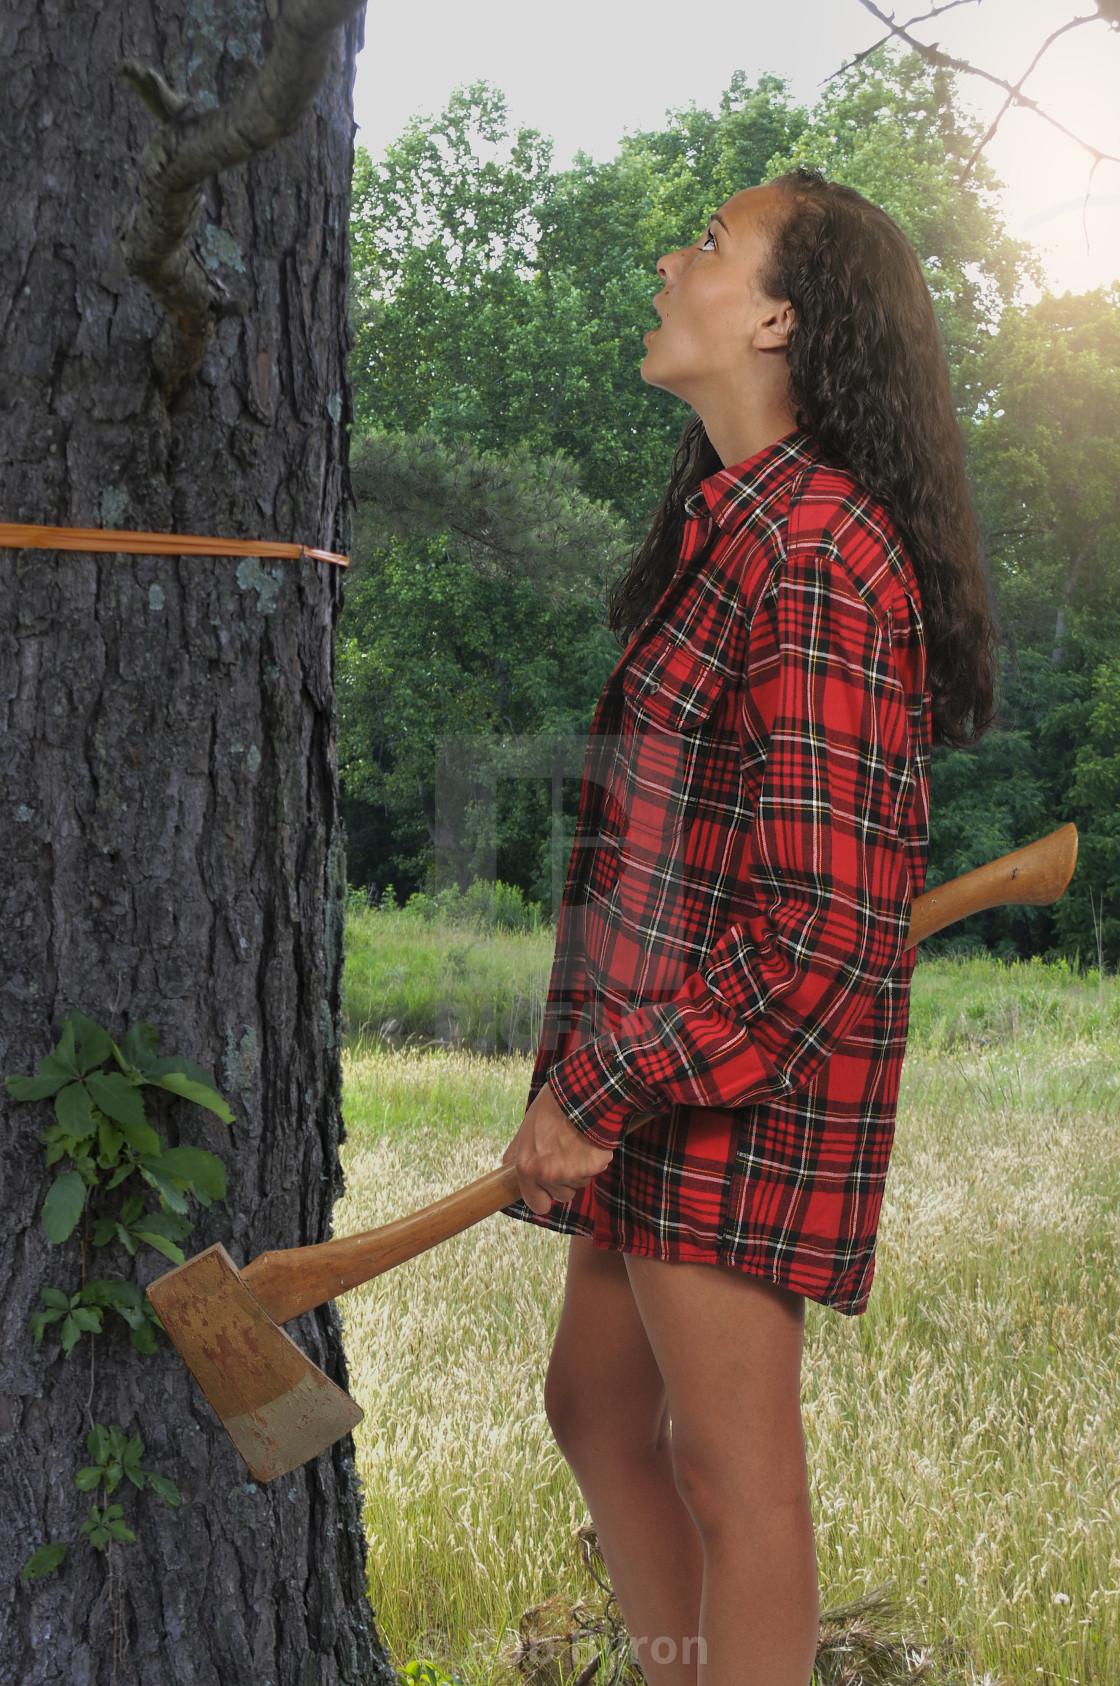 """Woman Lumberjack with an axe"" stock image"